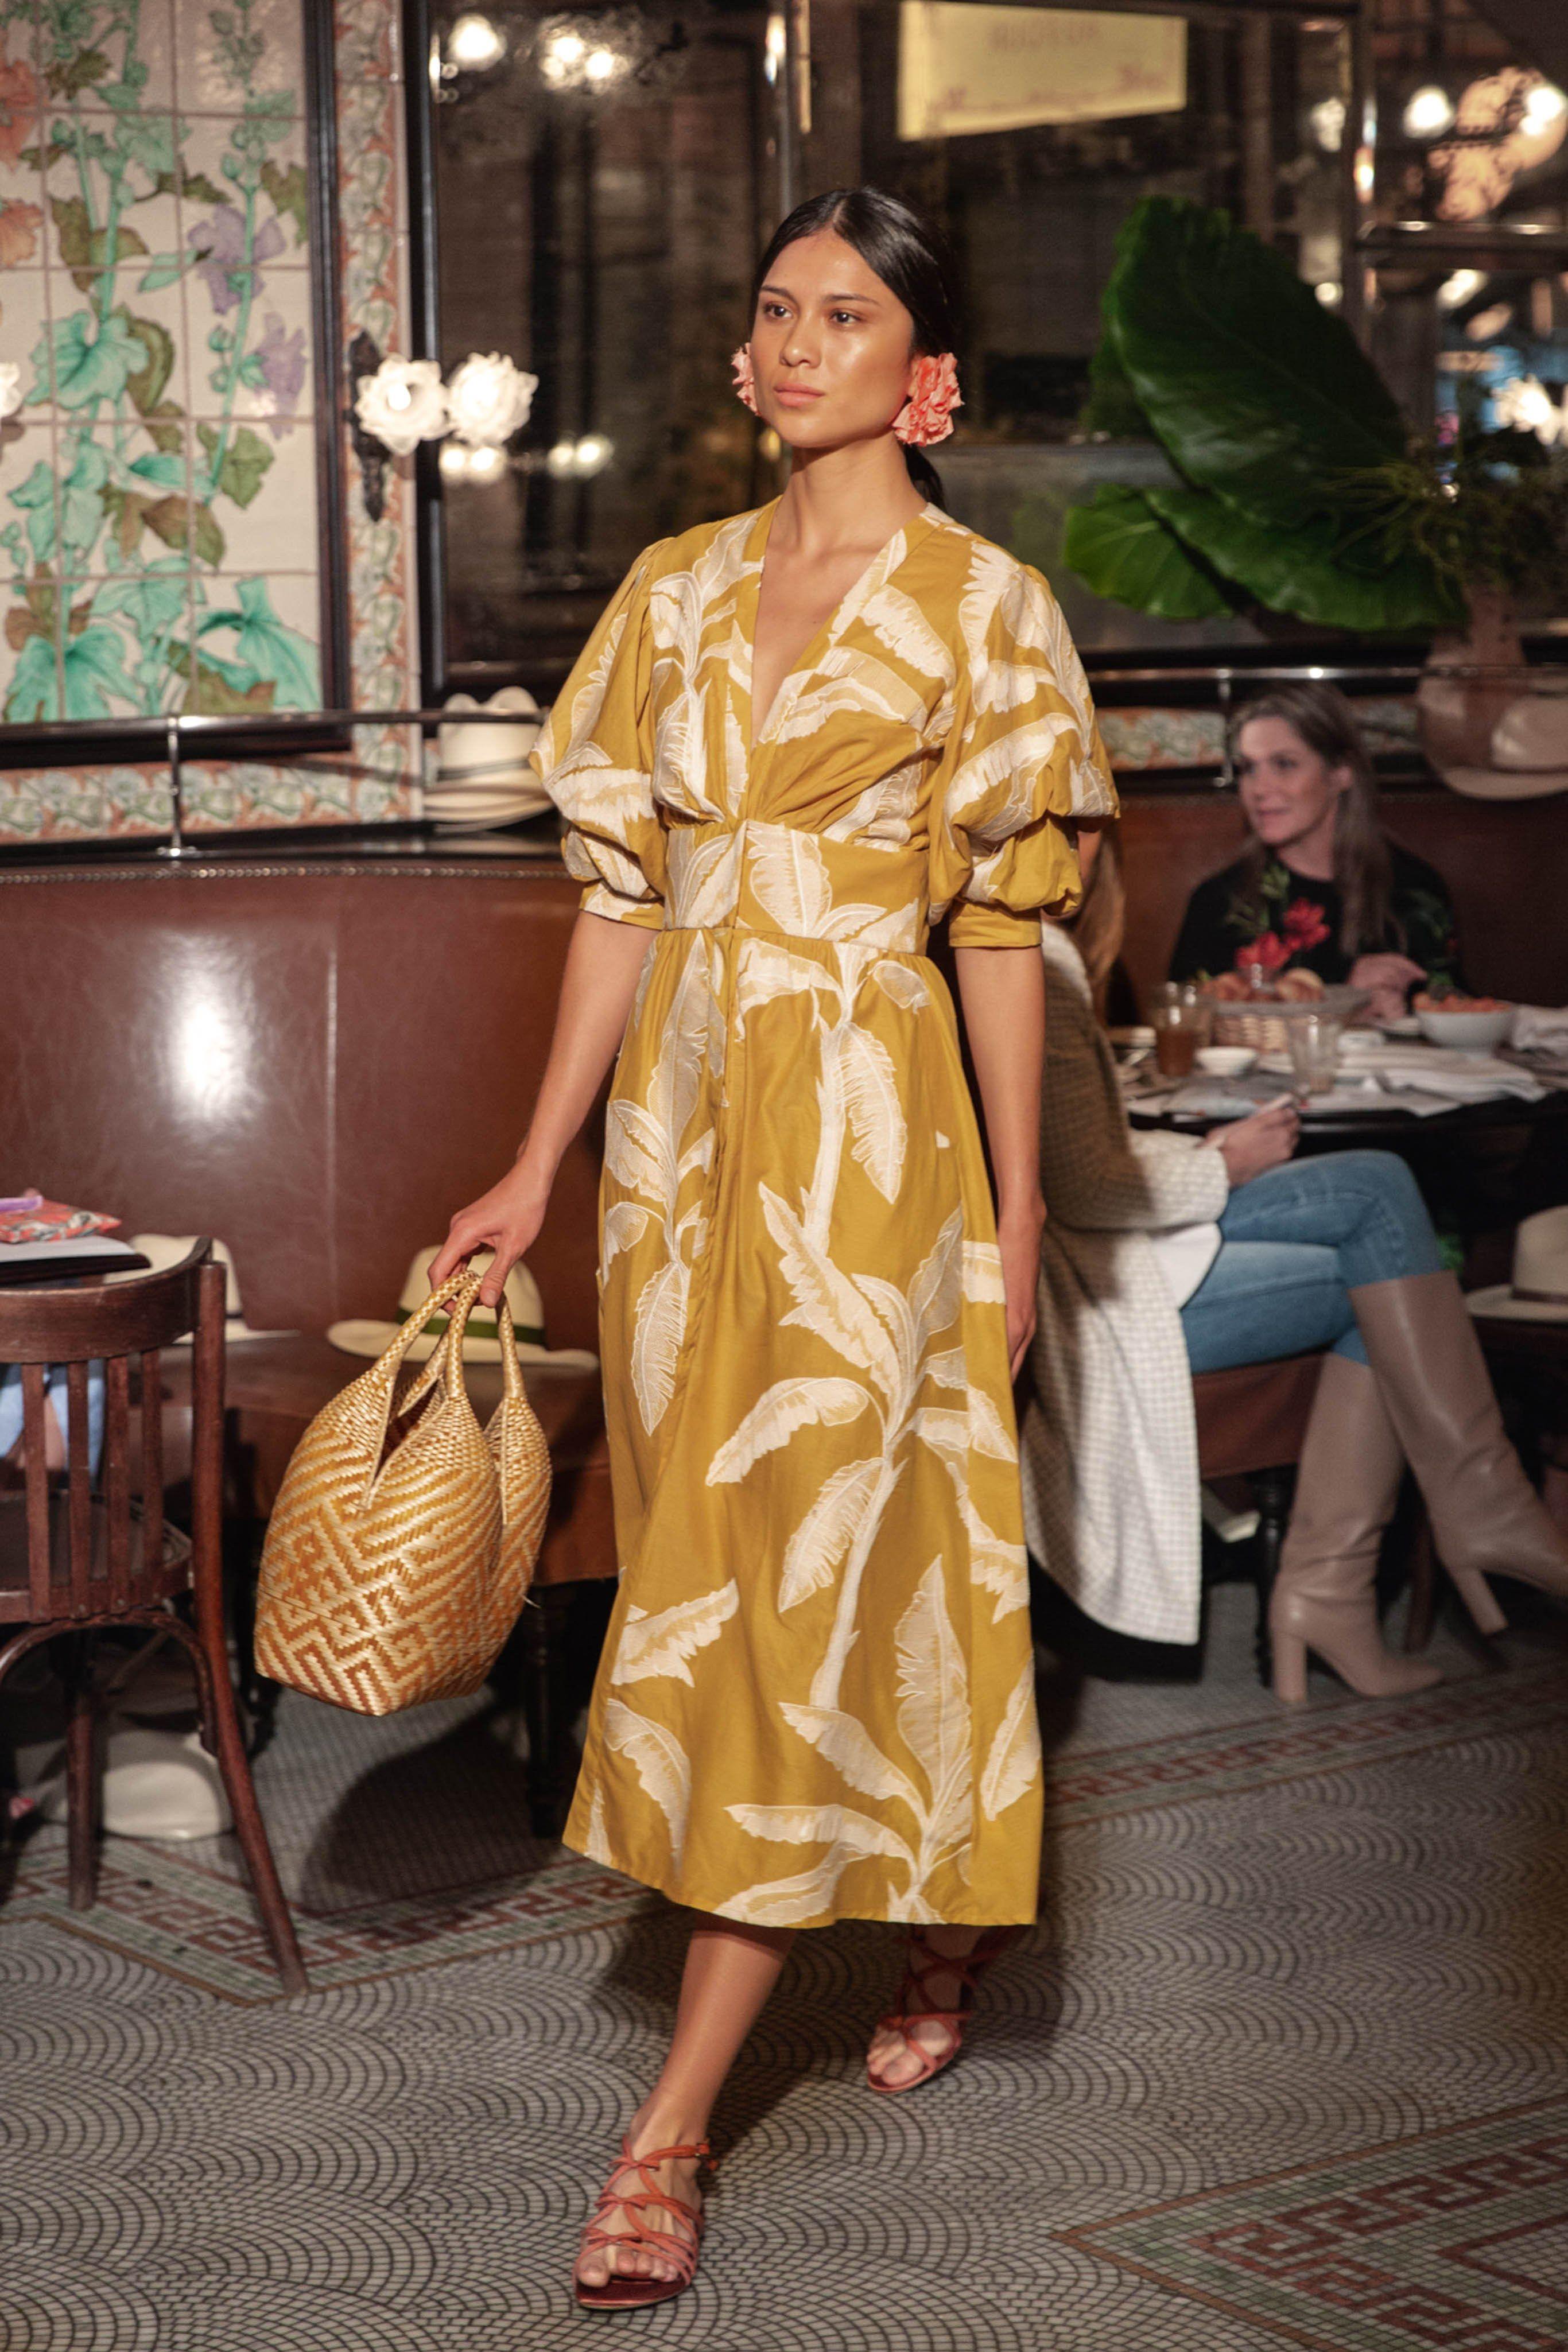 fe68e34f27 Johanna Ortiz Resort 2019 New York Collection - Vogue Summer Maxi Dress  Outfit